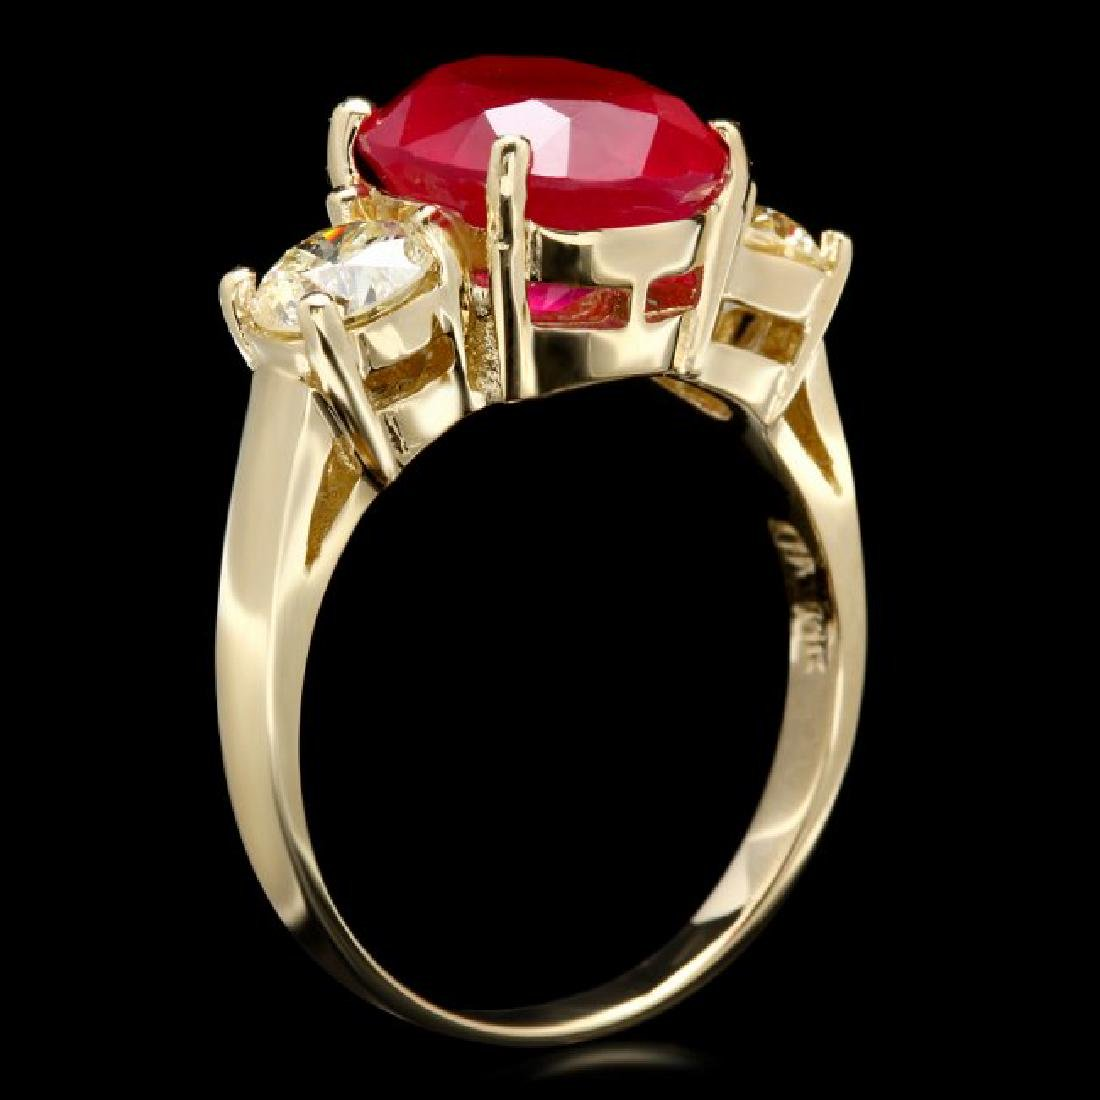 14k Yellow Gold 5.00ct Ruby 1.10ct Diamond Ring - 3